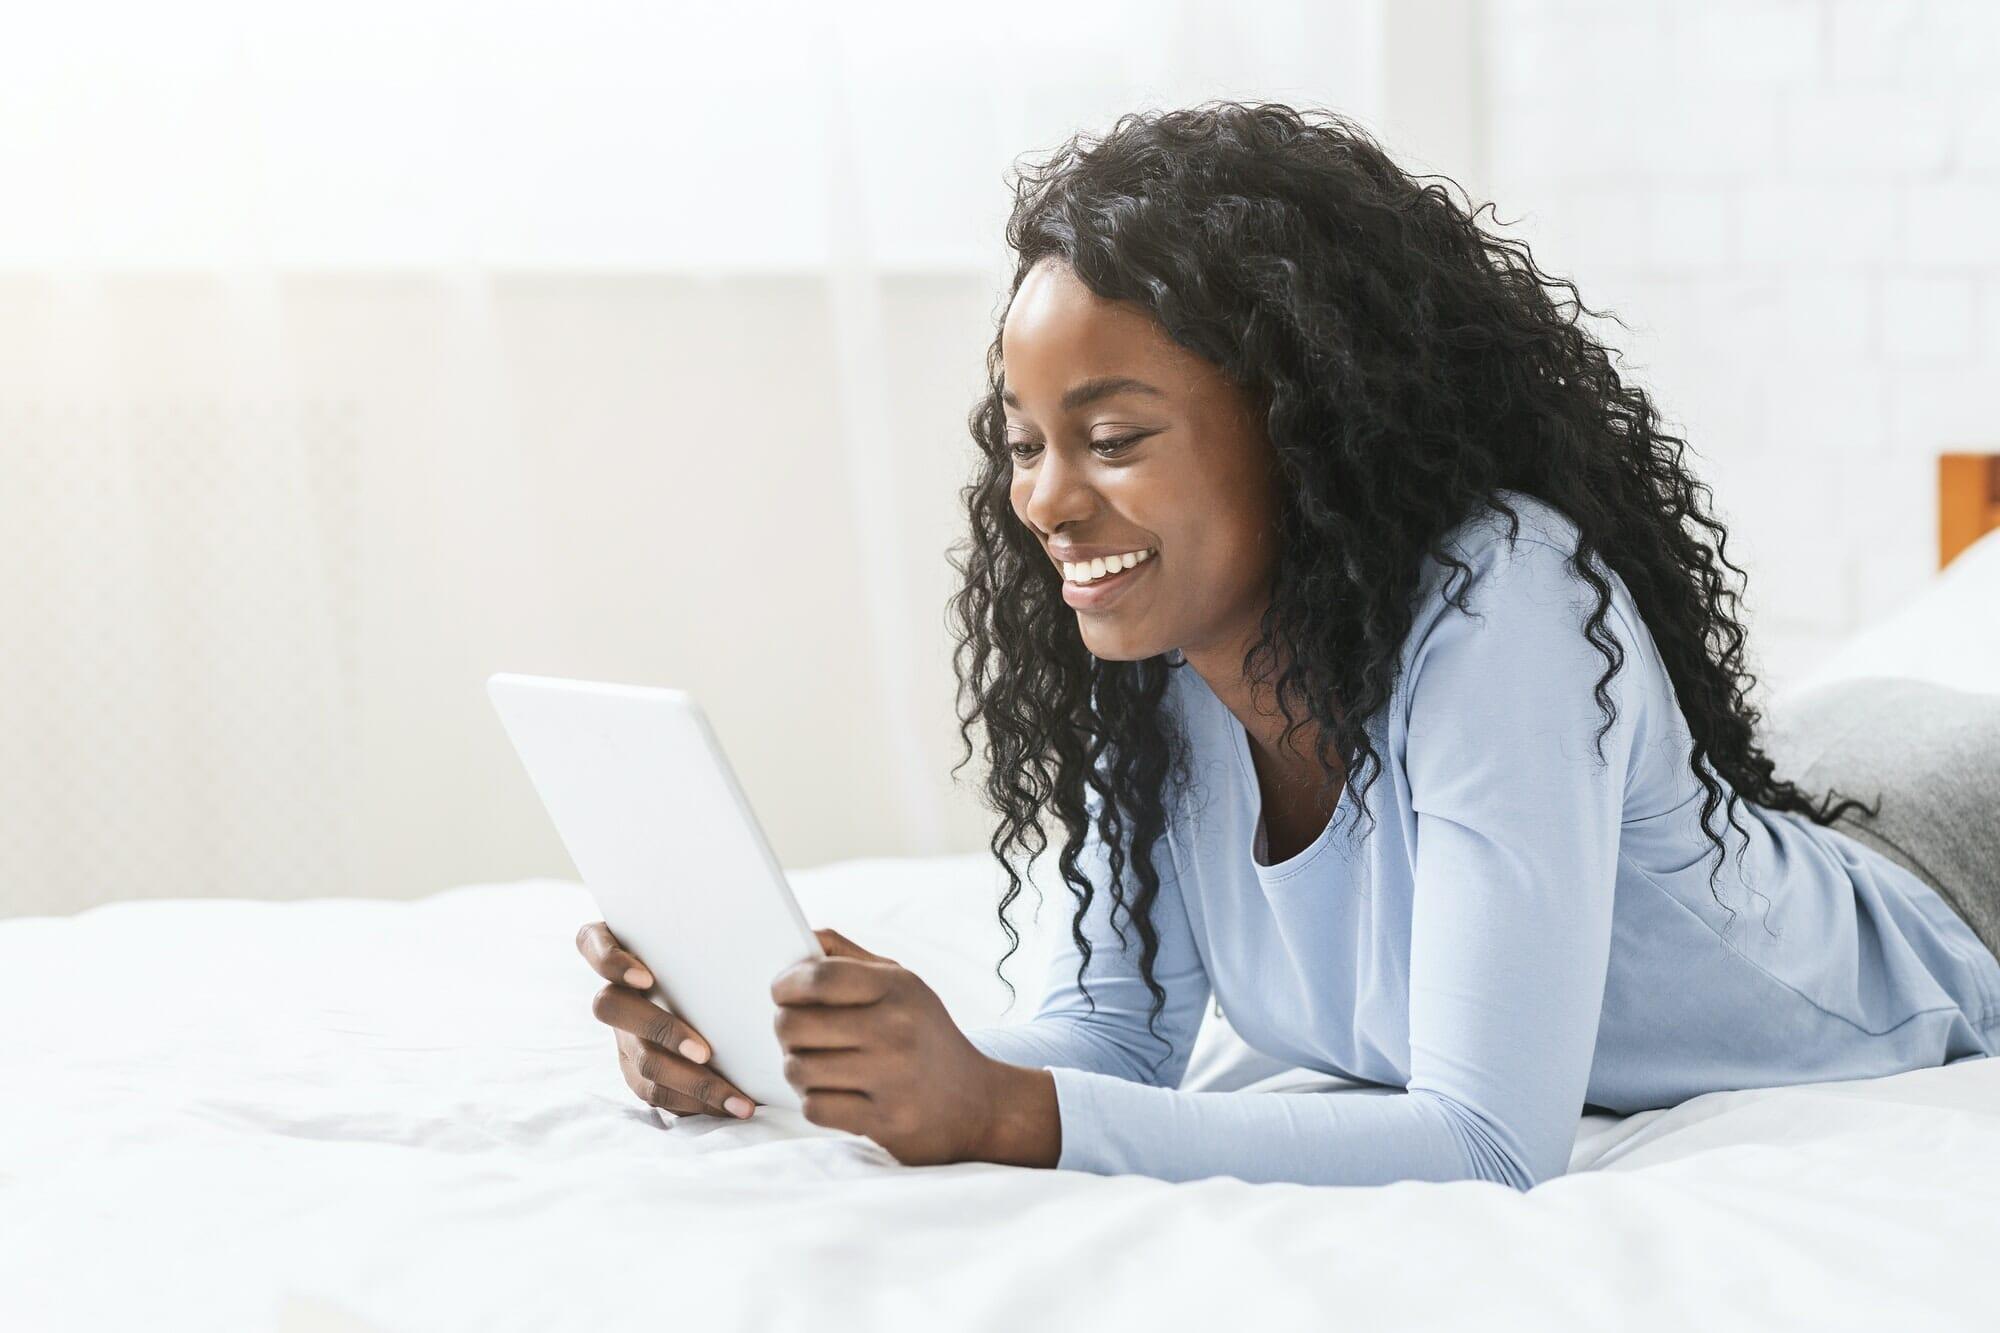 Girl reading blog on digital tablet in bed